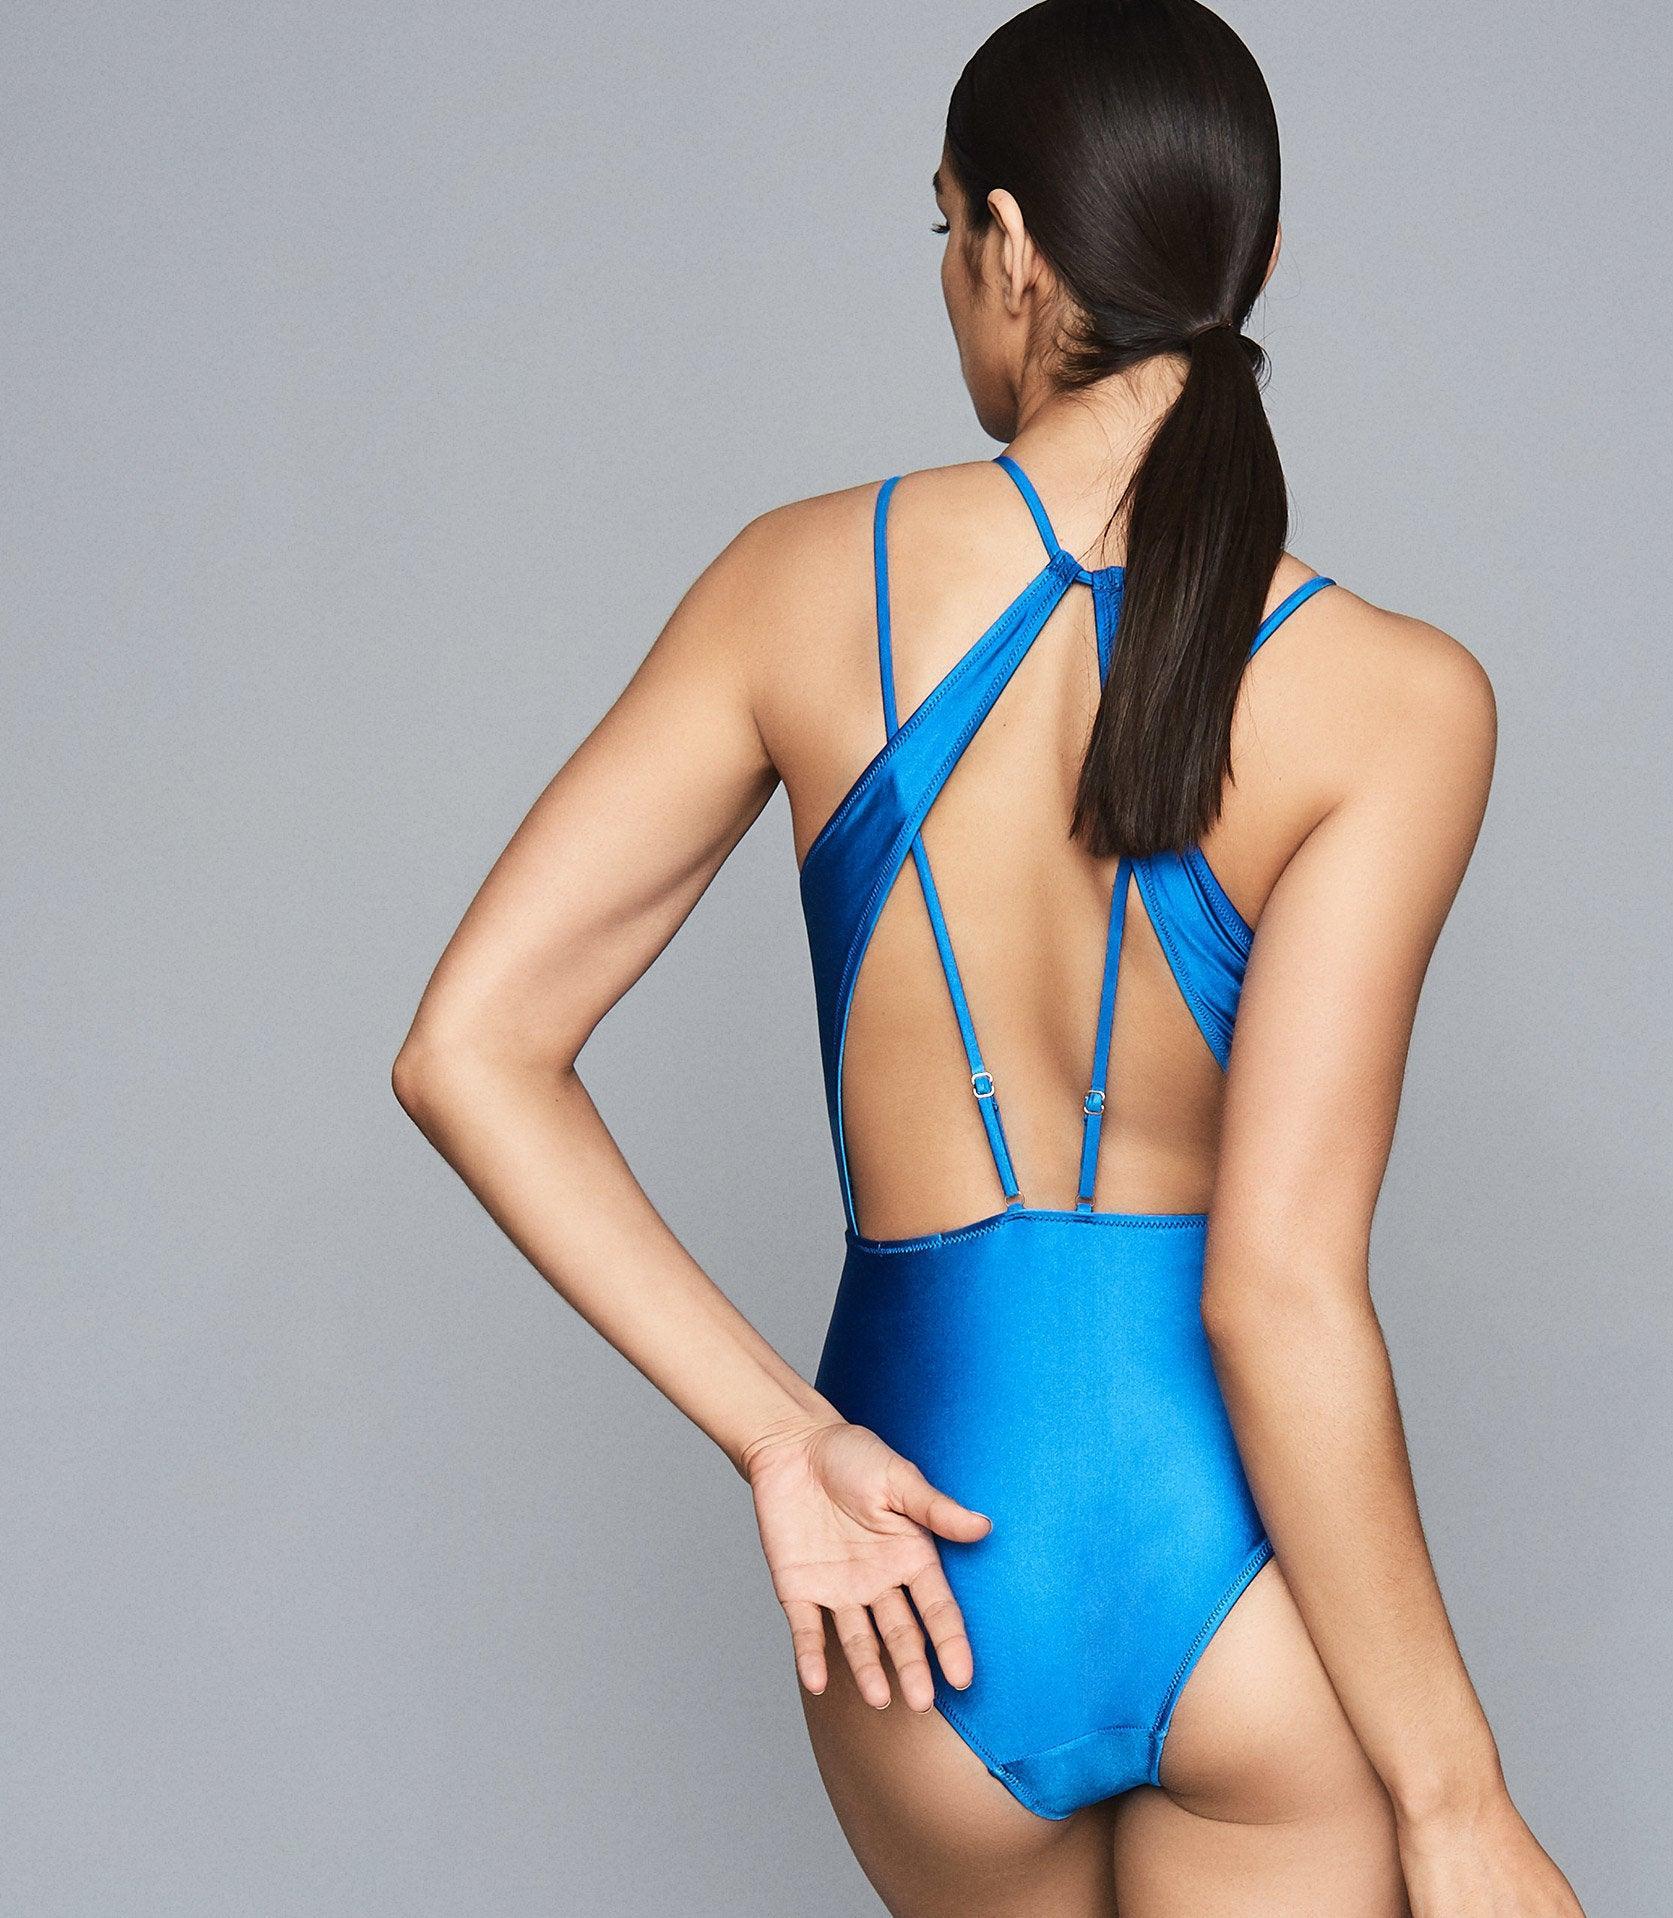 d31a83d9b0 Reiss Rosie - Cut Out Back Swimsuit in Blue - Lyst